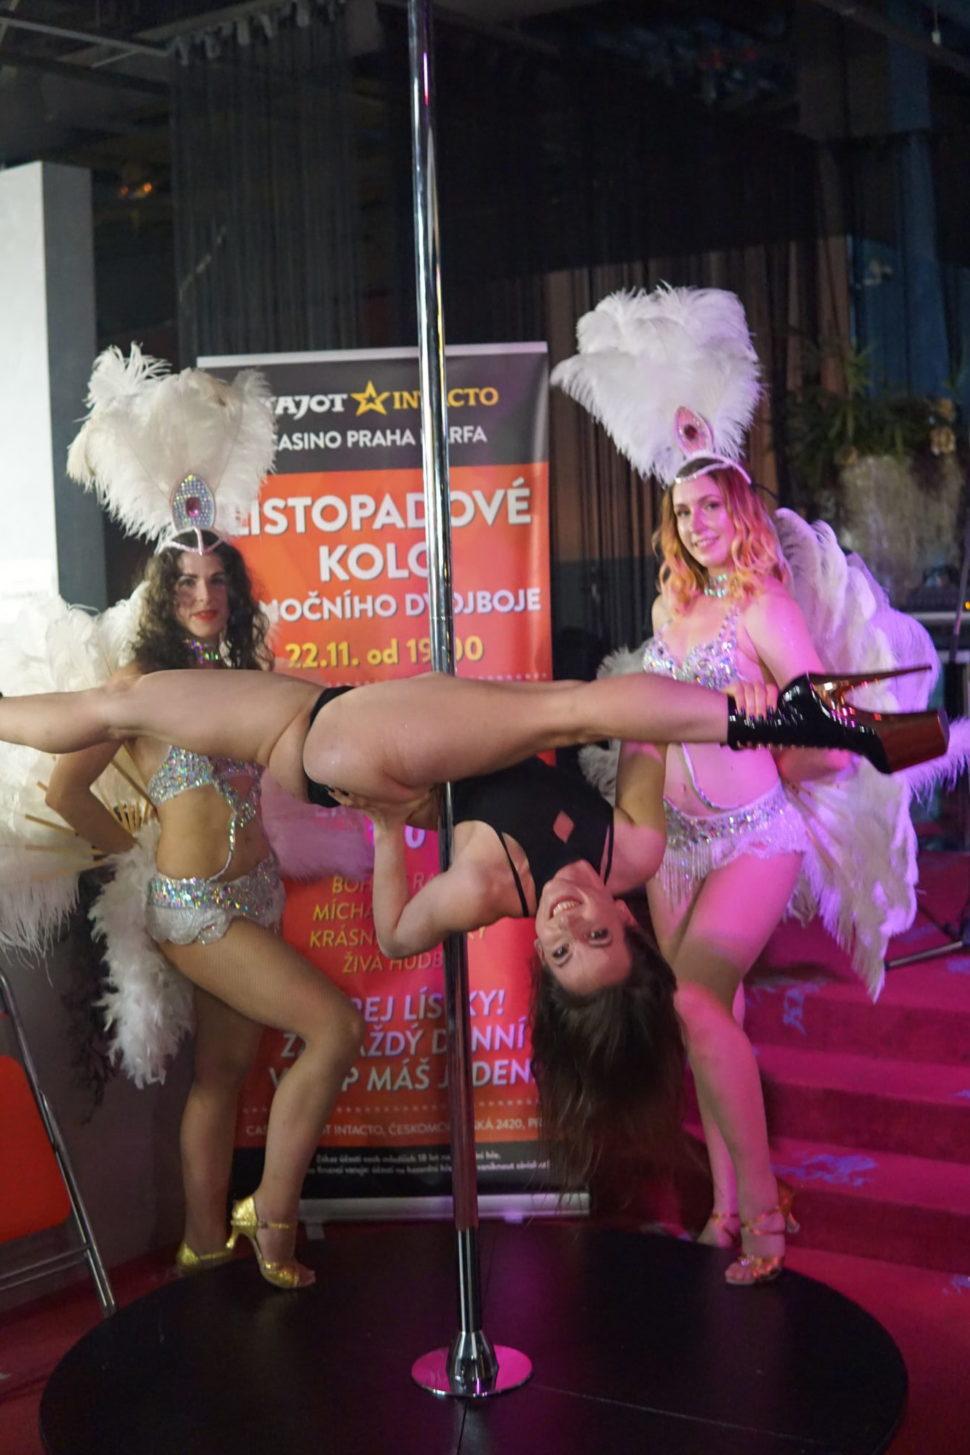 Burlesque kabaret